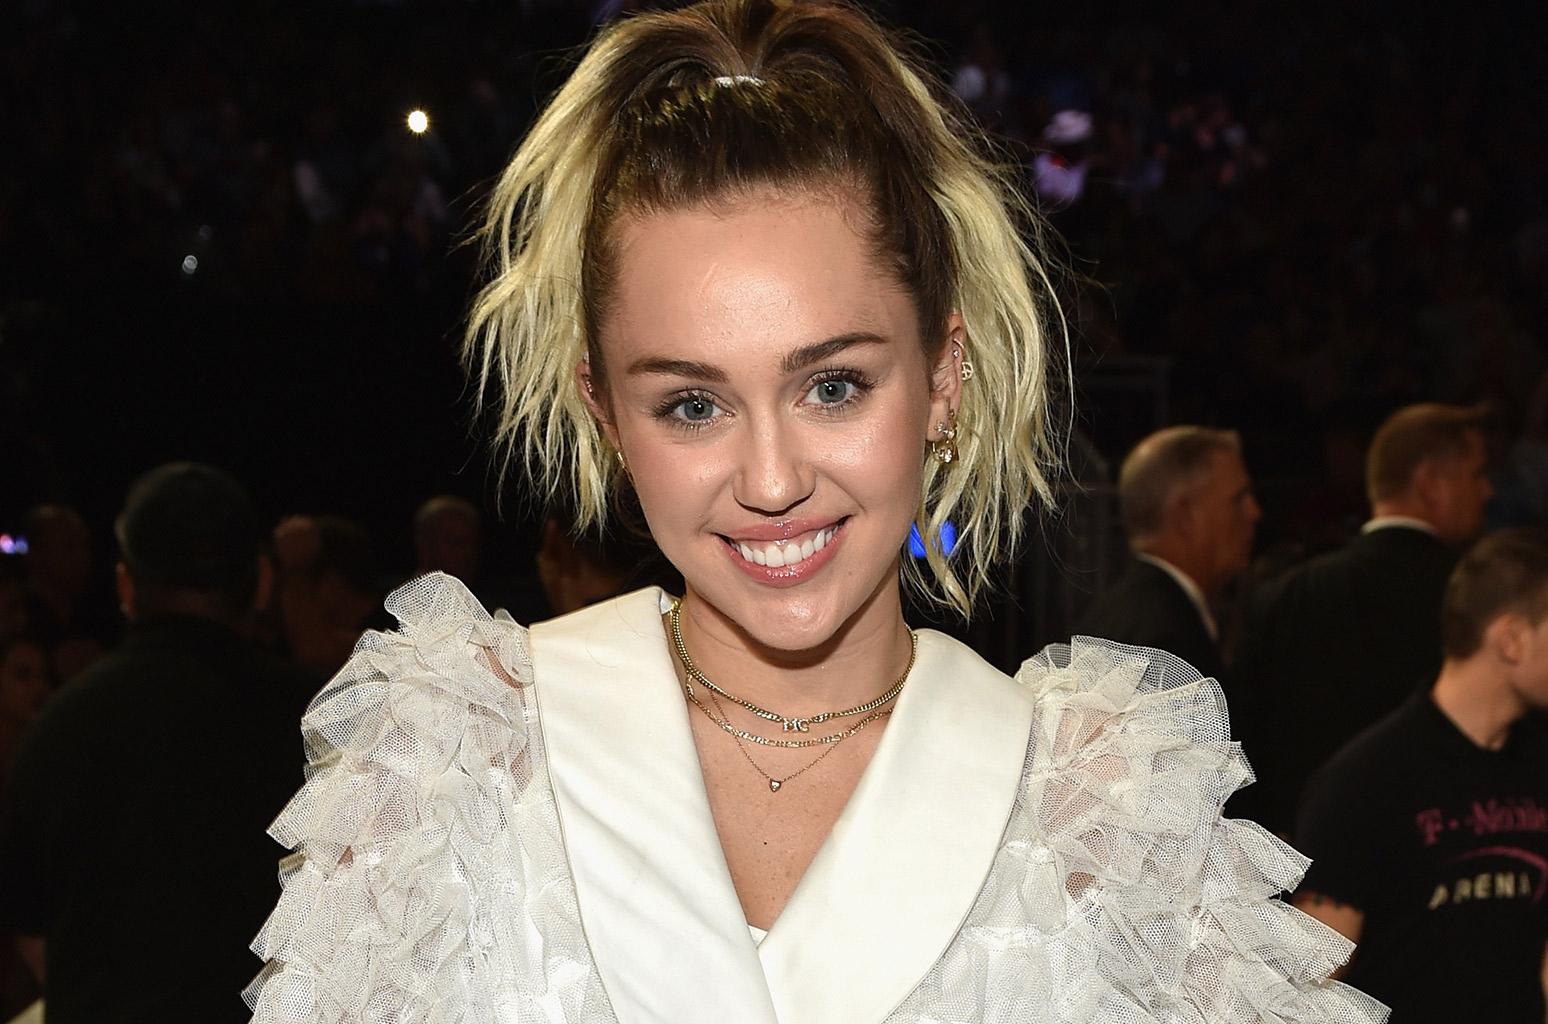 Best Family Car >> Miley Cyrus Net Worth 2017: $200 Million | CelebJury